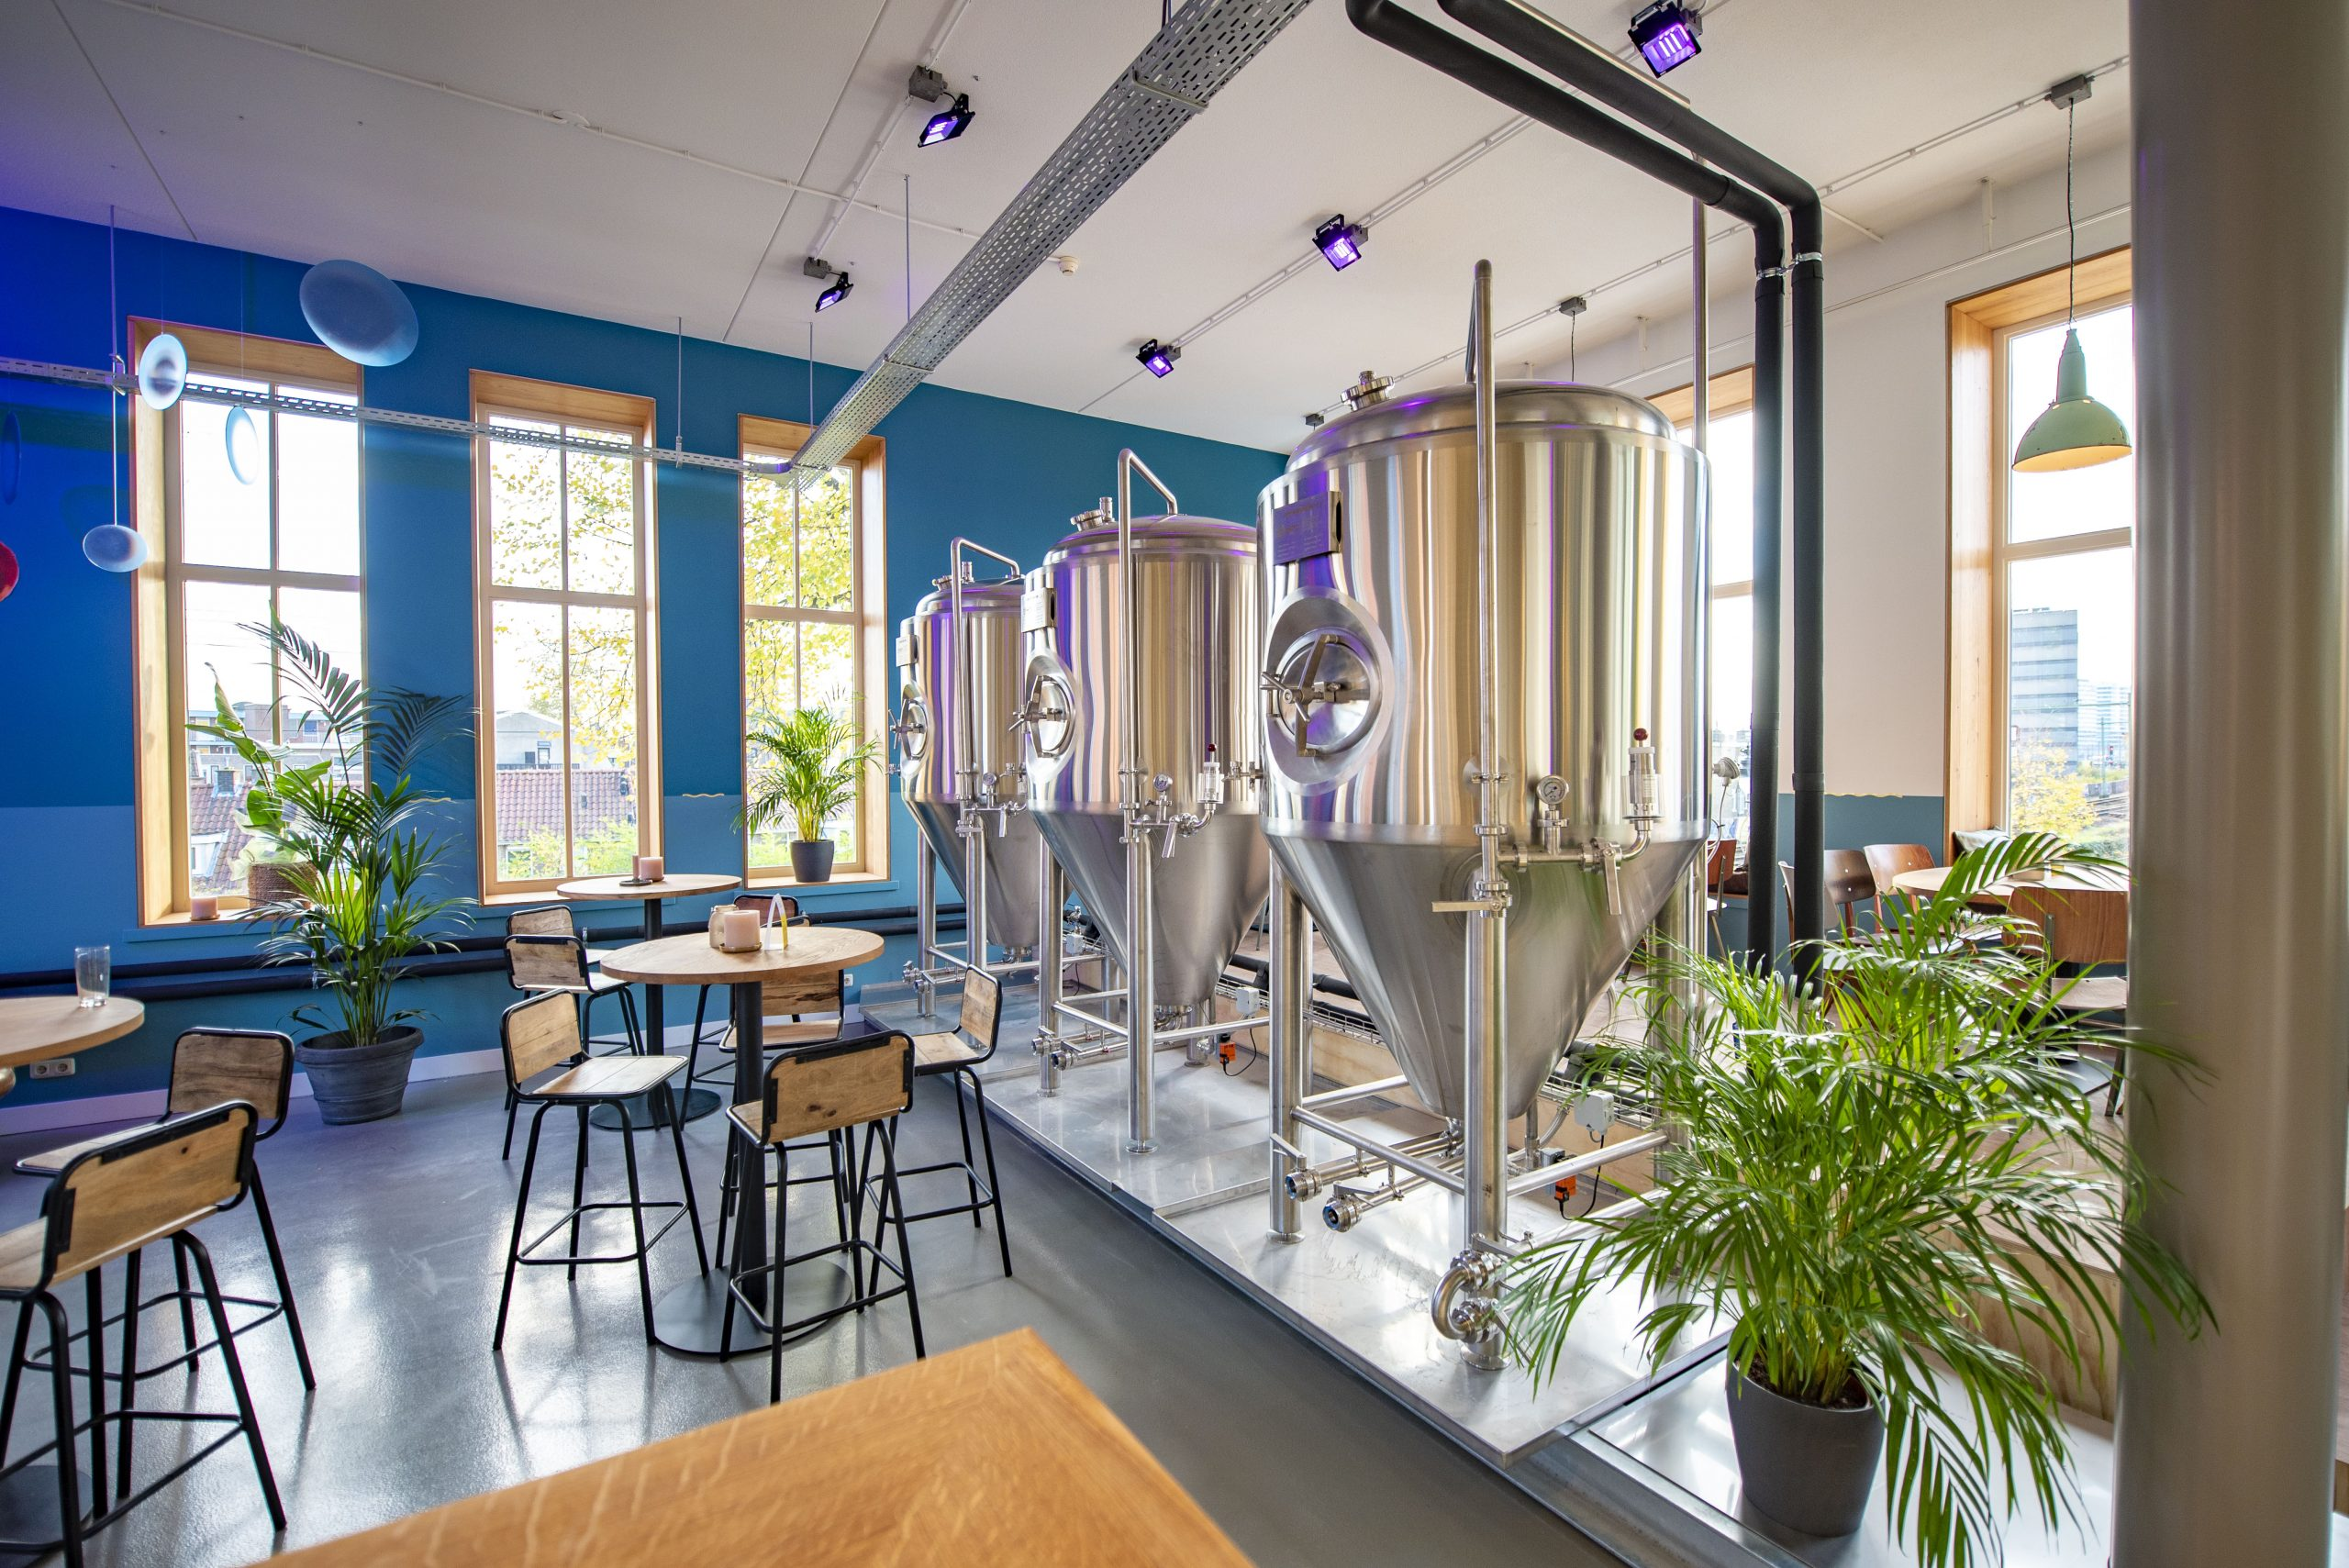 Brouwerij Arnhem